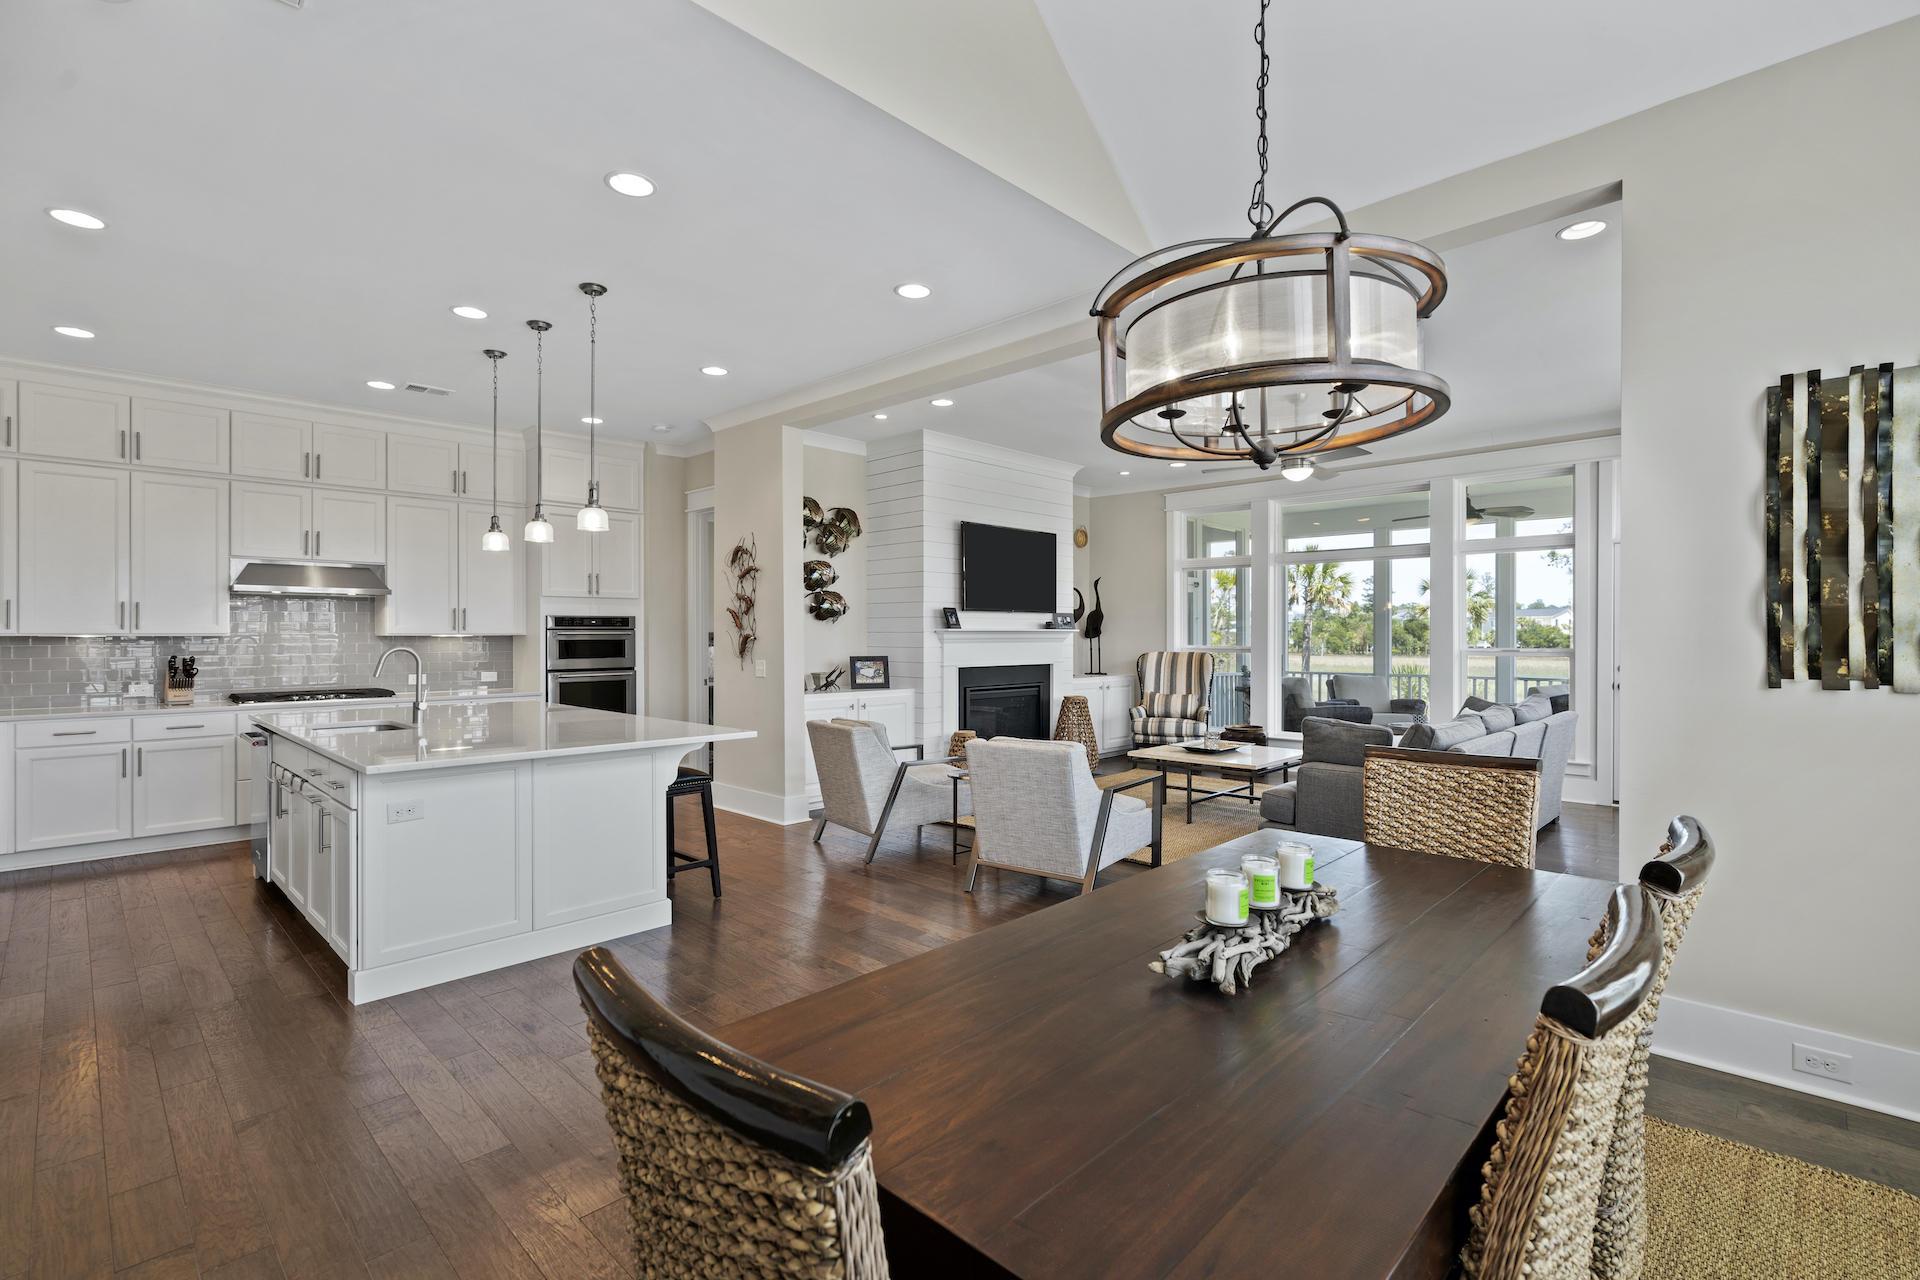 Dunes West Homes For Sale - 2316 Bucktail, Mount Pleasant, SC - 37